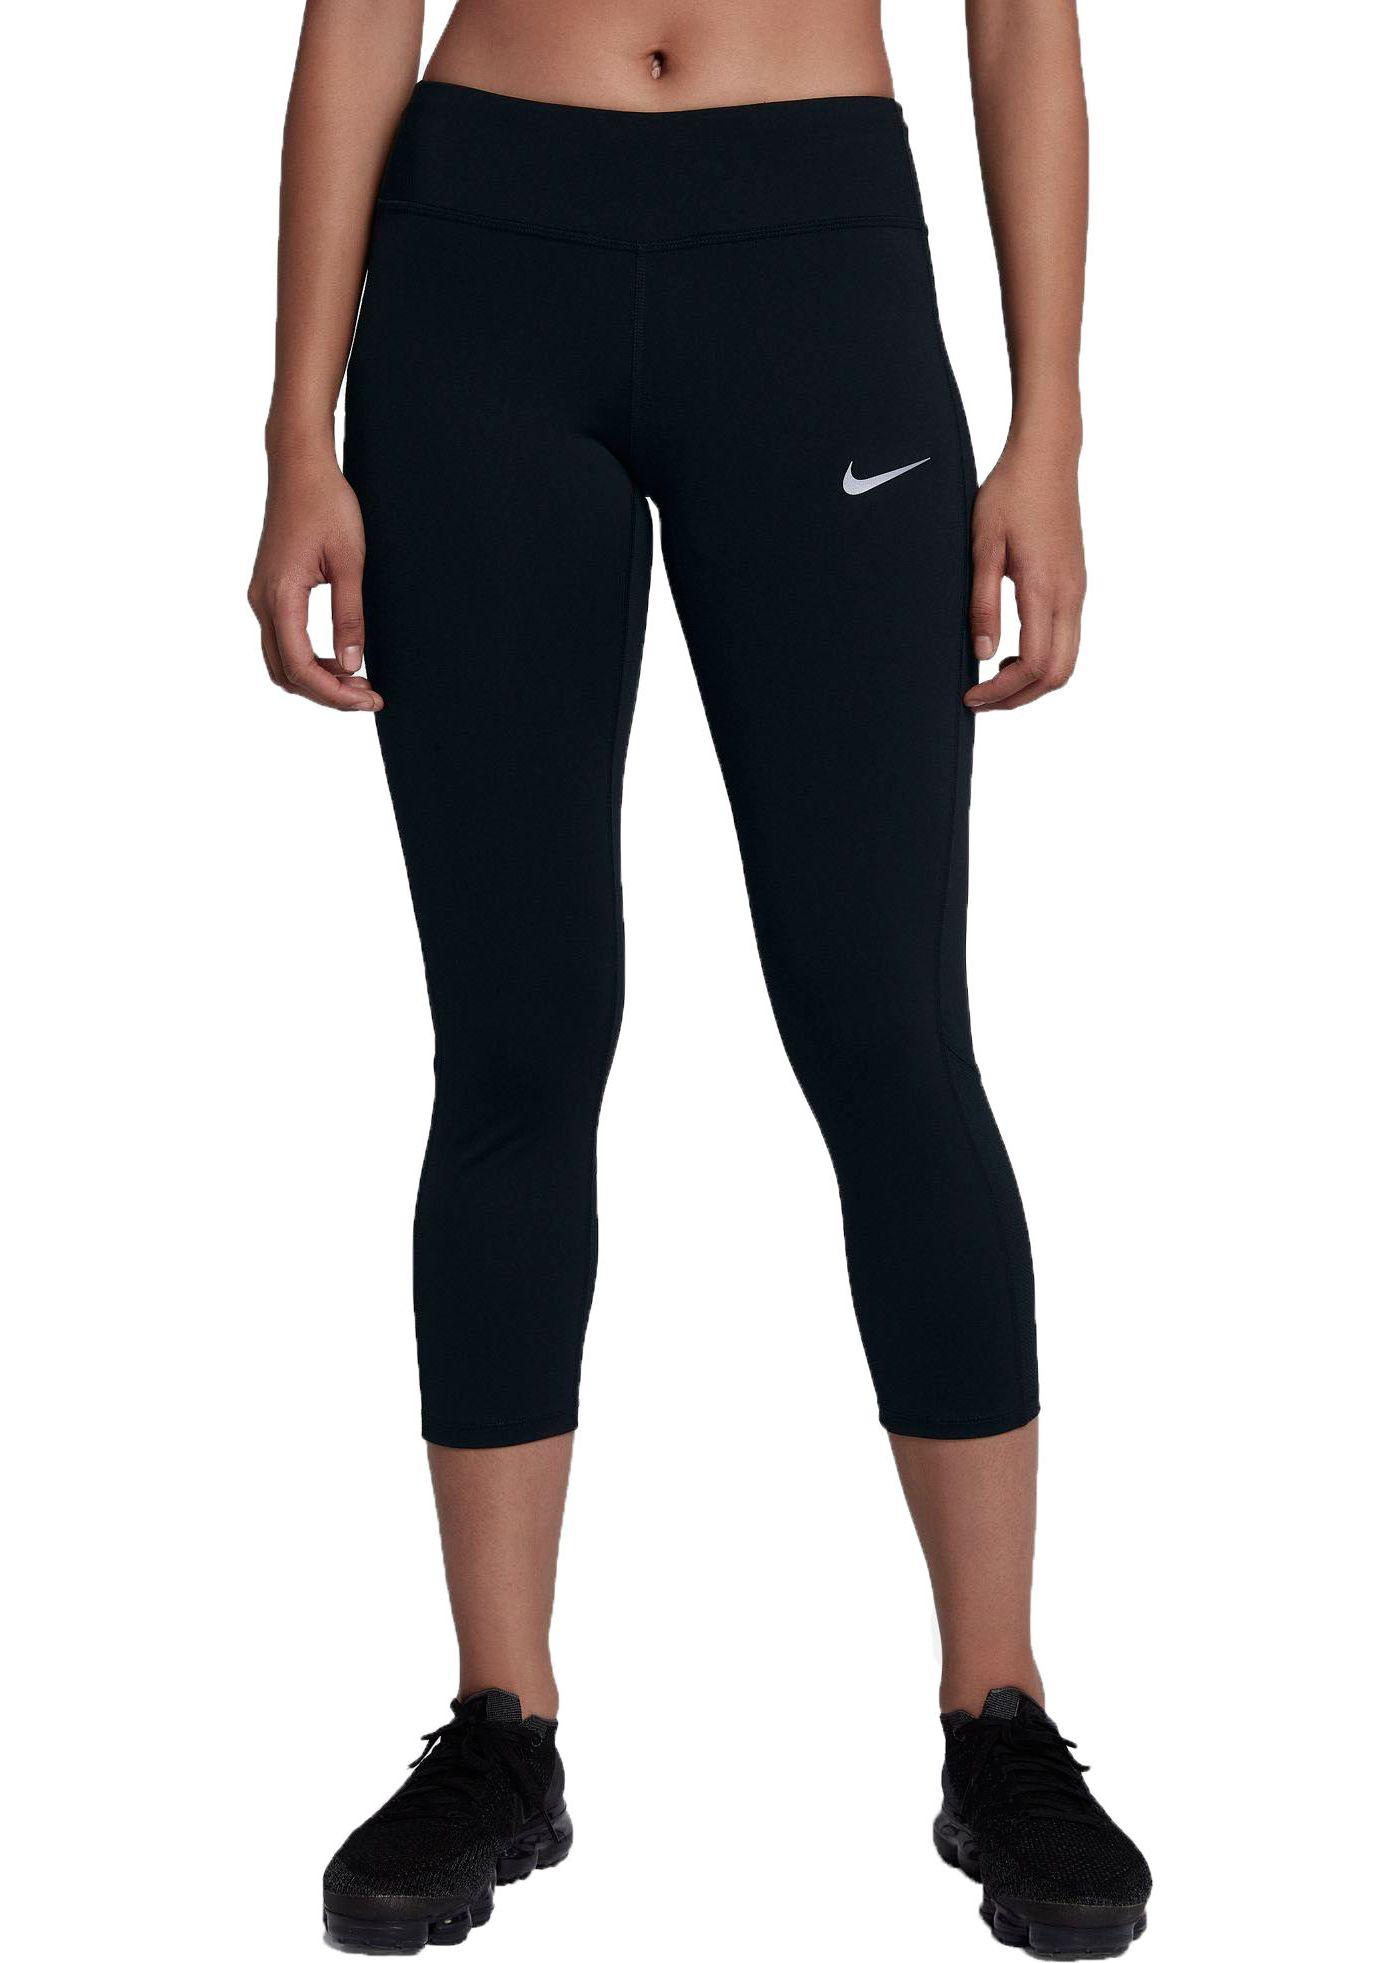 Nike Women's Power Running Crop Leggings